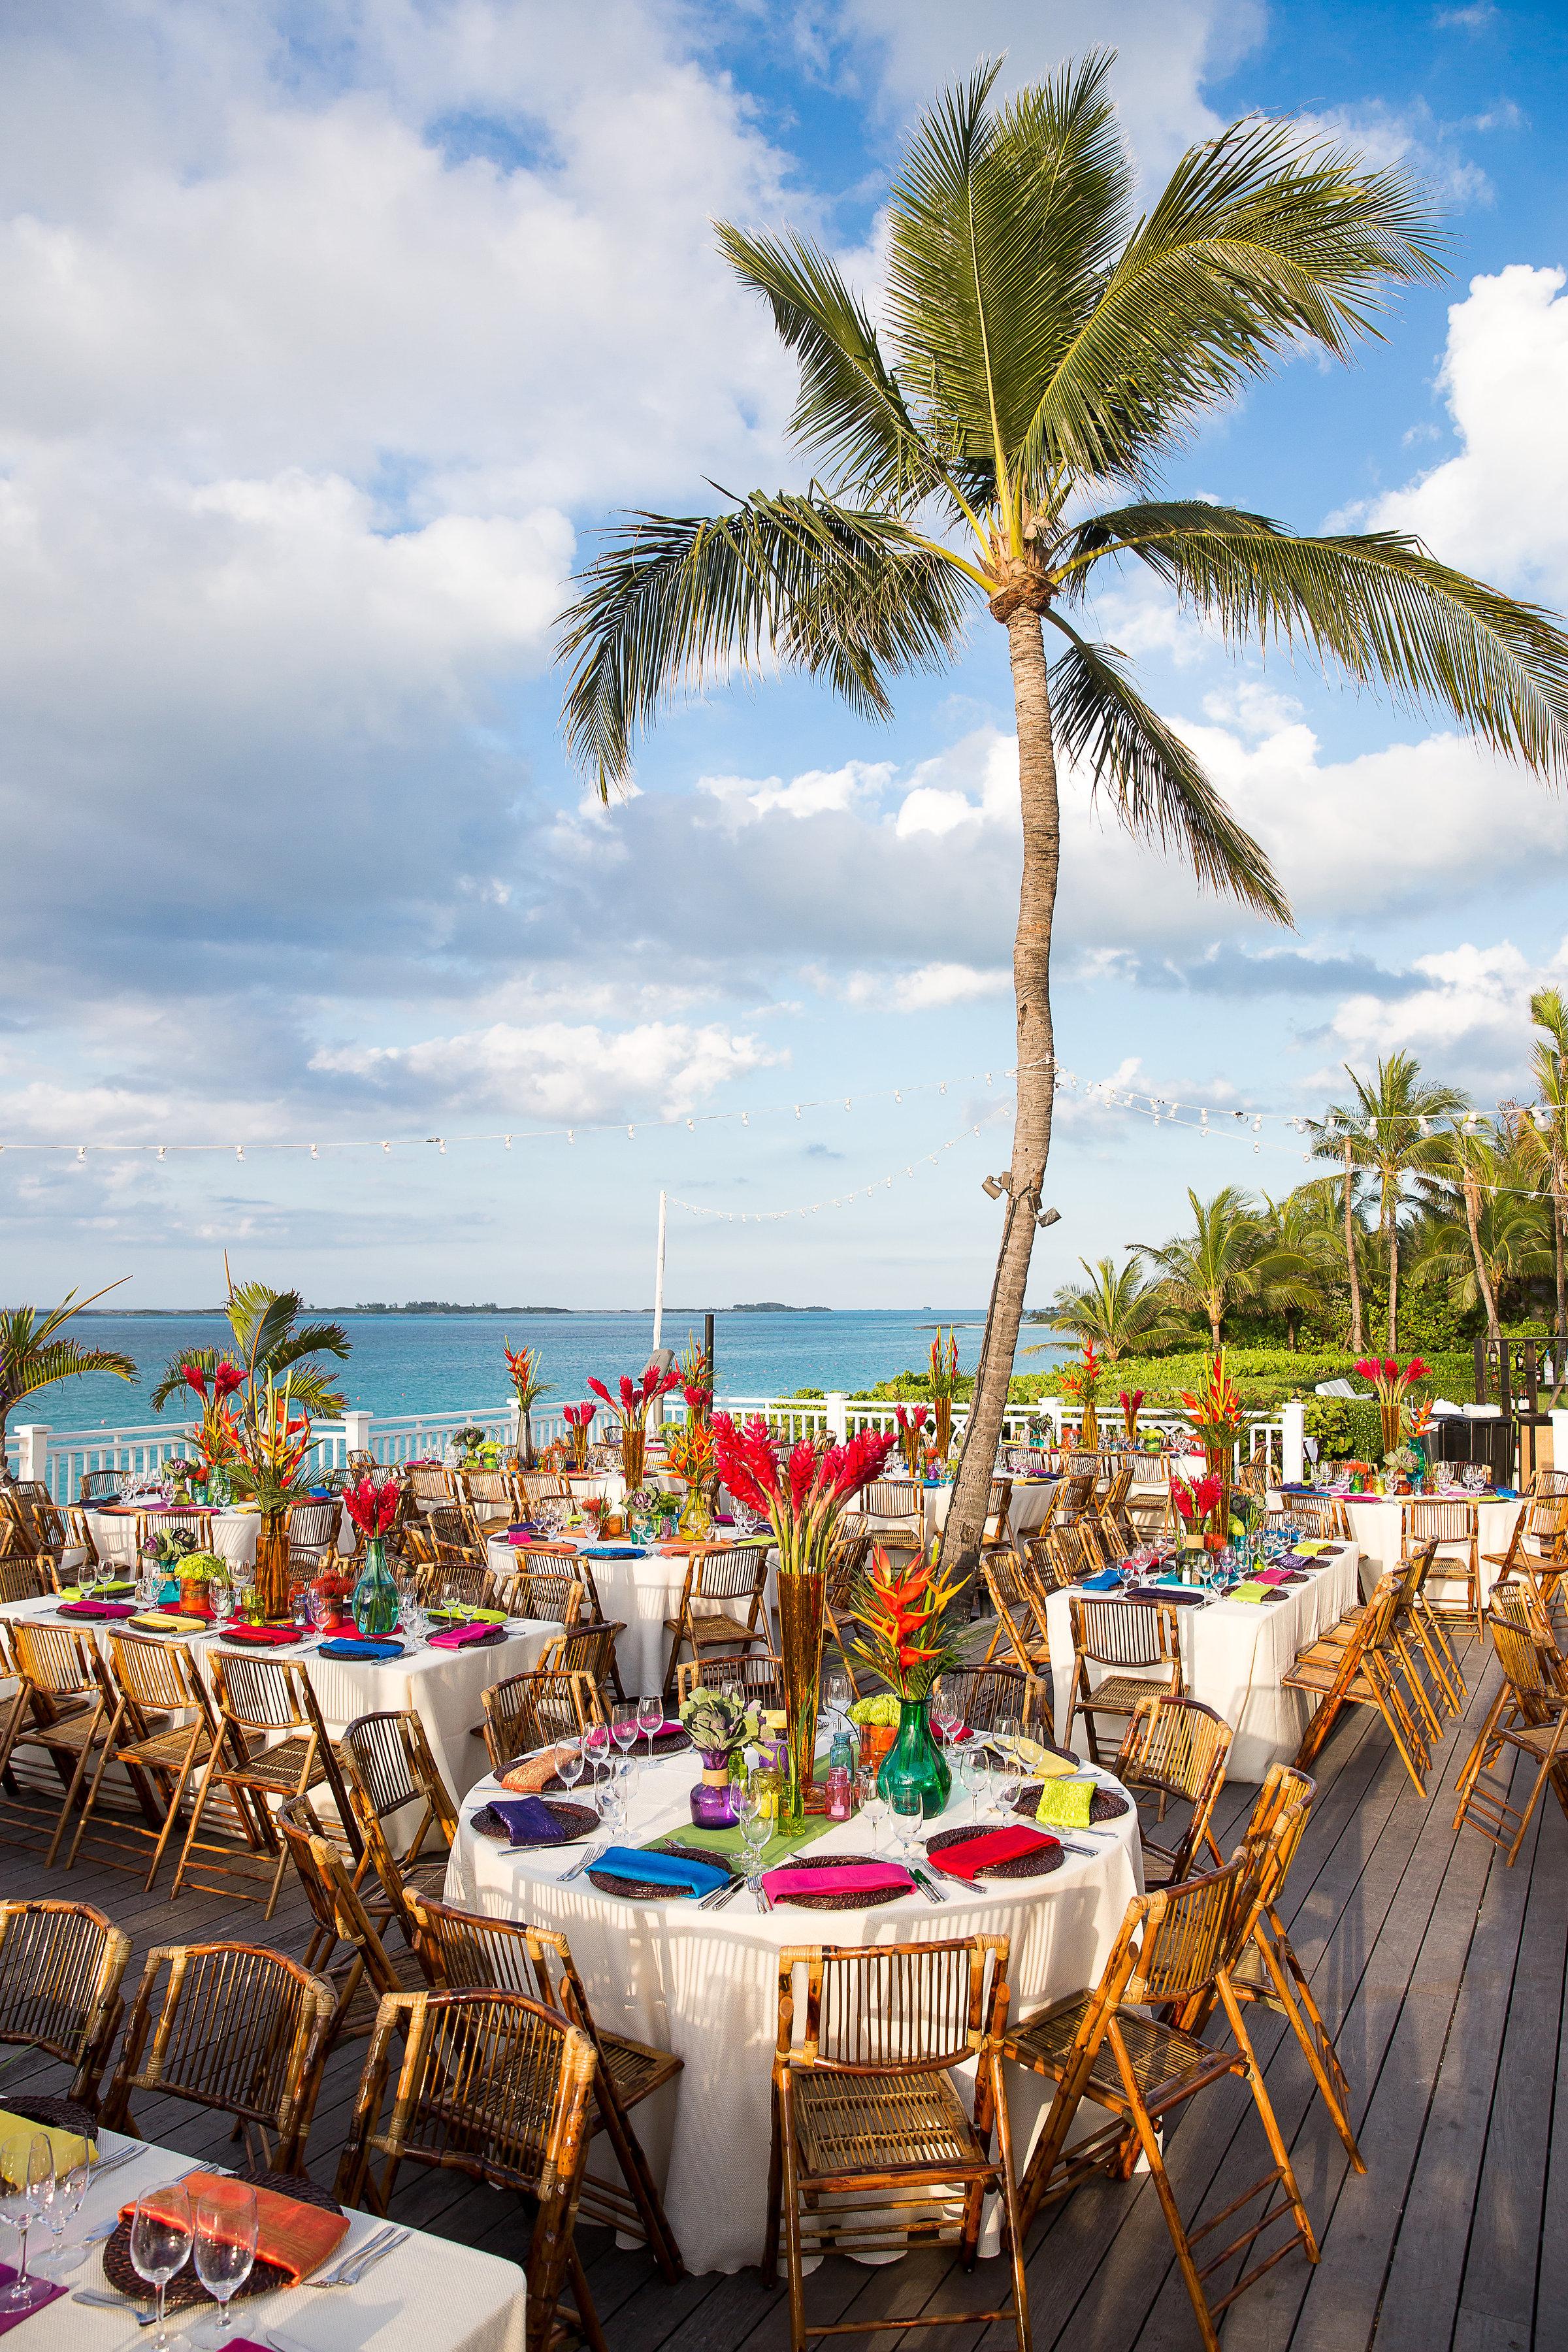 Ceci_New_York_Ceci_Style_Ceci_Johnson_Luxury_Lifestyle_Destination_Bahamas_Wedding_Letterpress_Inspiration_Design_Custom_Couture_Personalized_Invitations_24.jpg